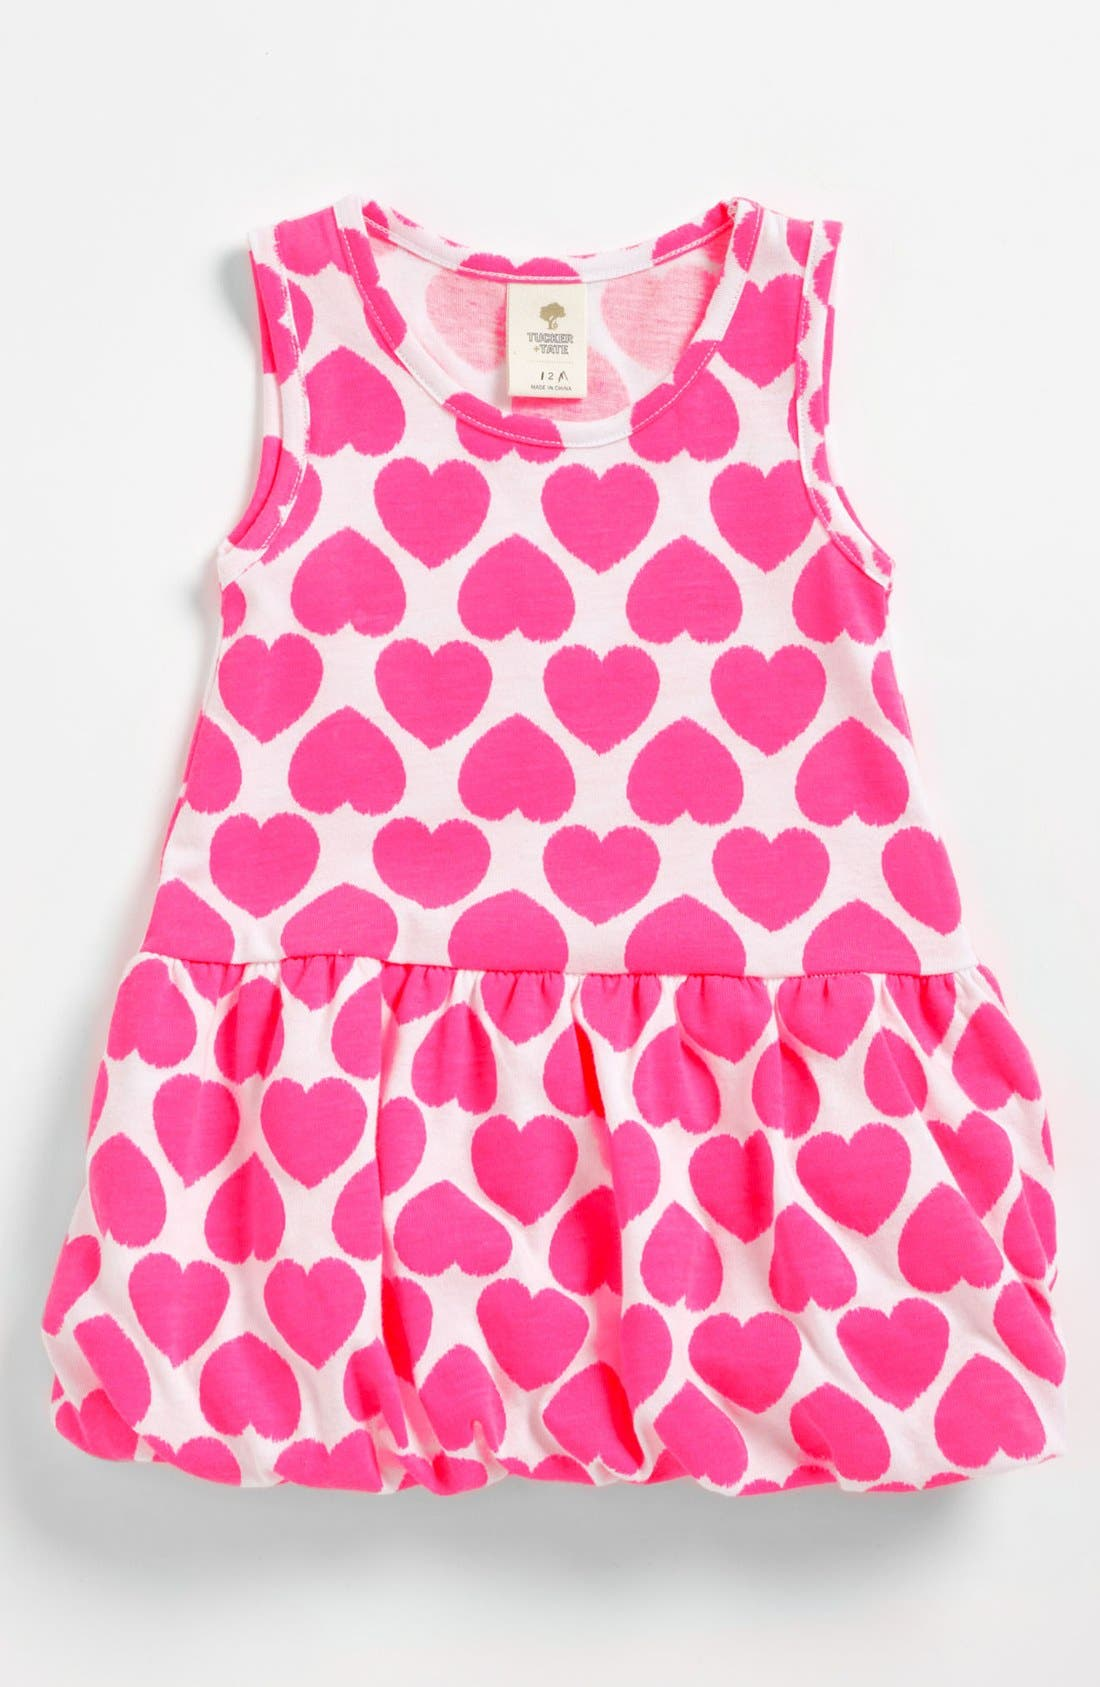 Alternate Image 1 Selected - Tucker + Tate 'Azure' Knit Dress (Toddler)